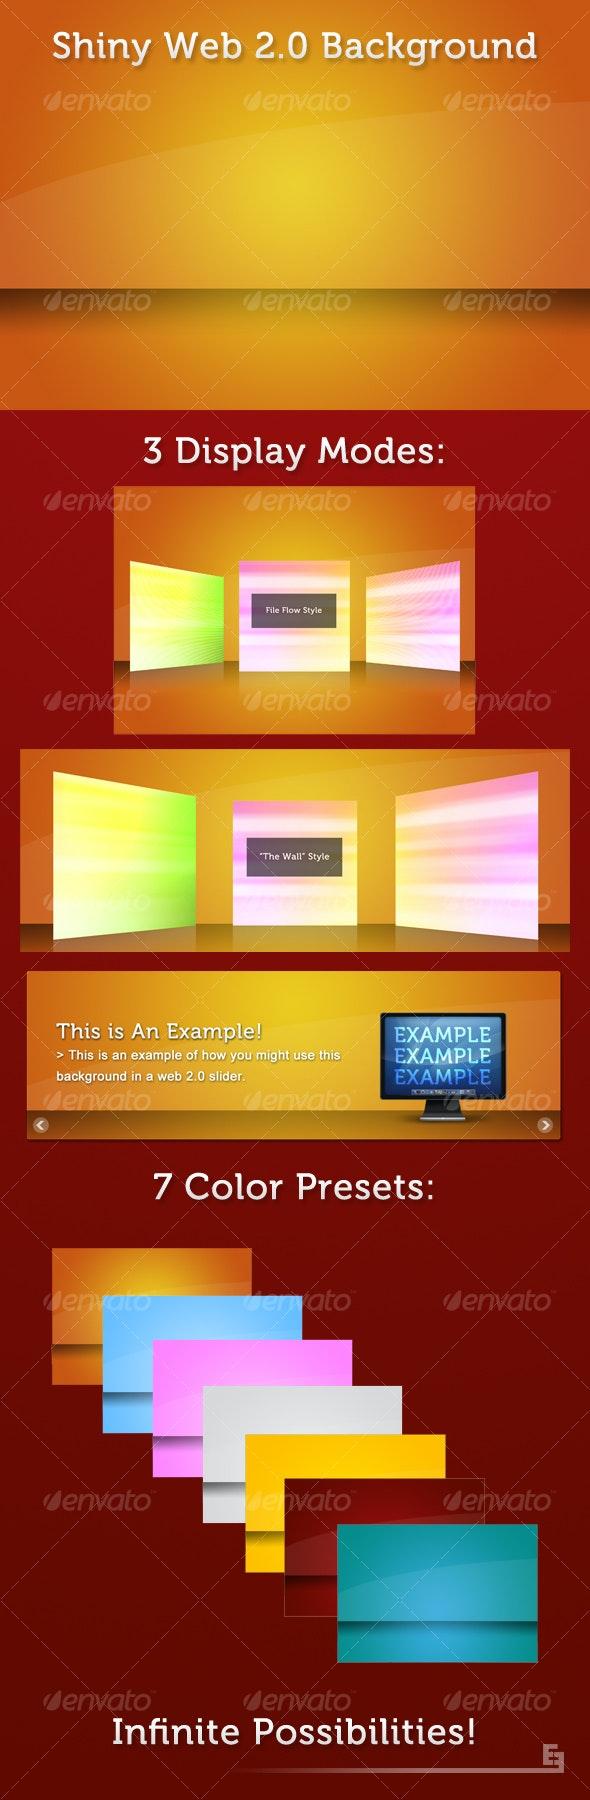 Shiny Web 2.0 Background - Tech / Futuristic Backgrounds